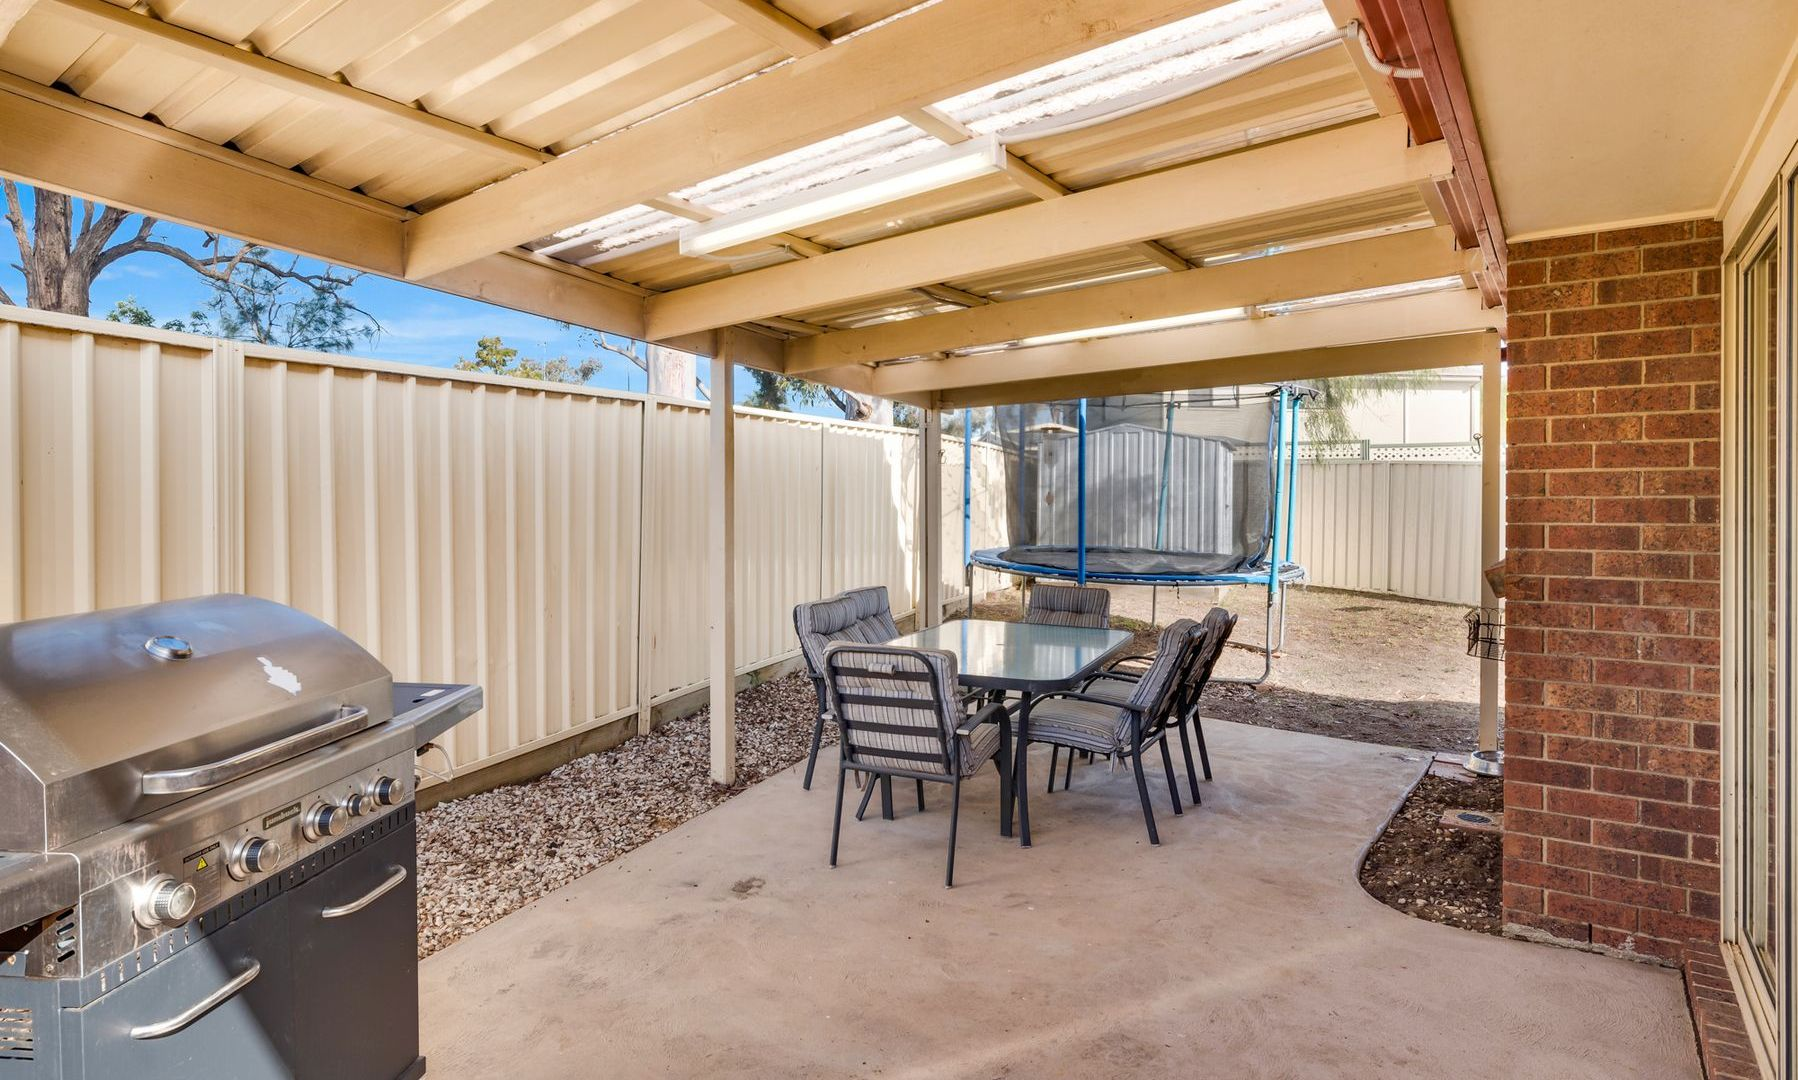 2/11 Chausson Place, Cranebrook NSW 2749, Image 1